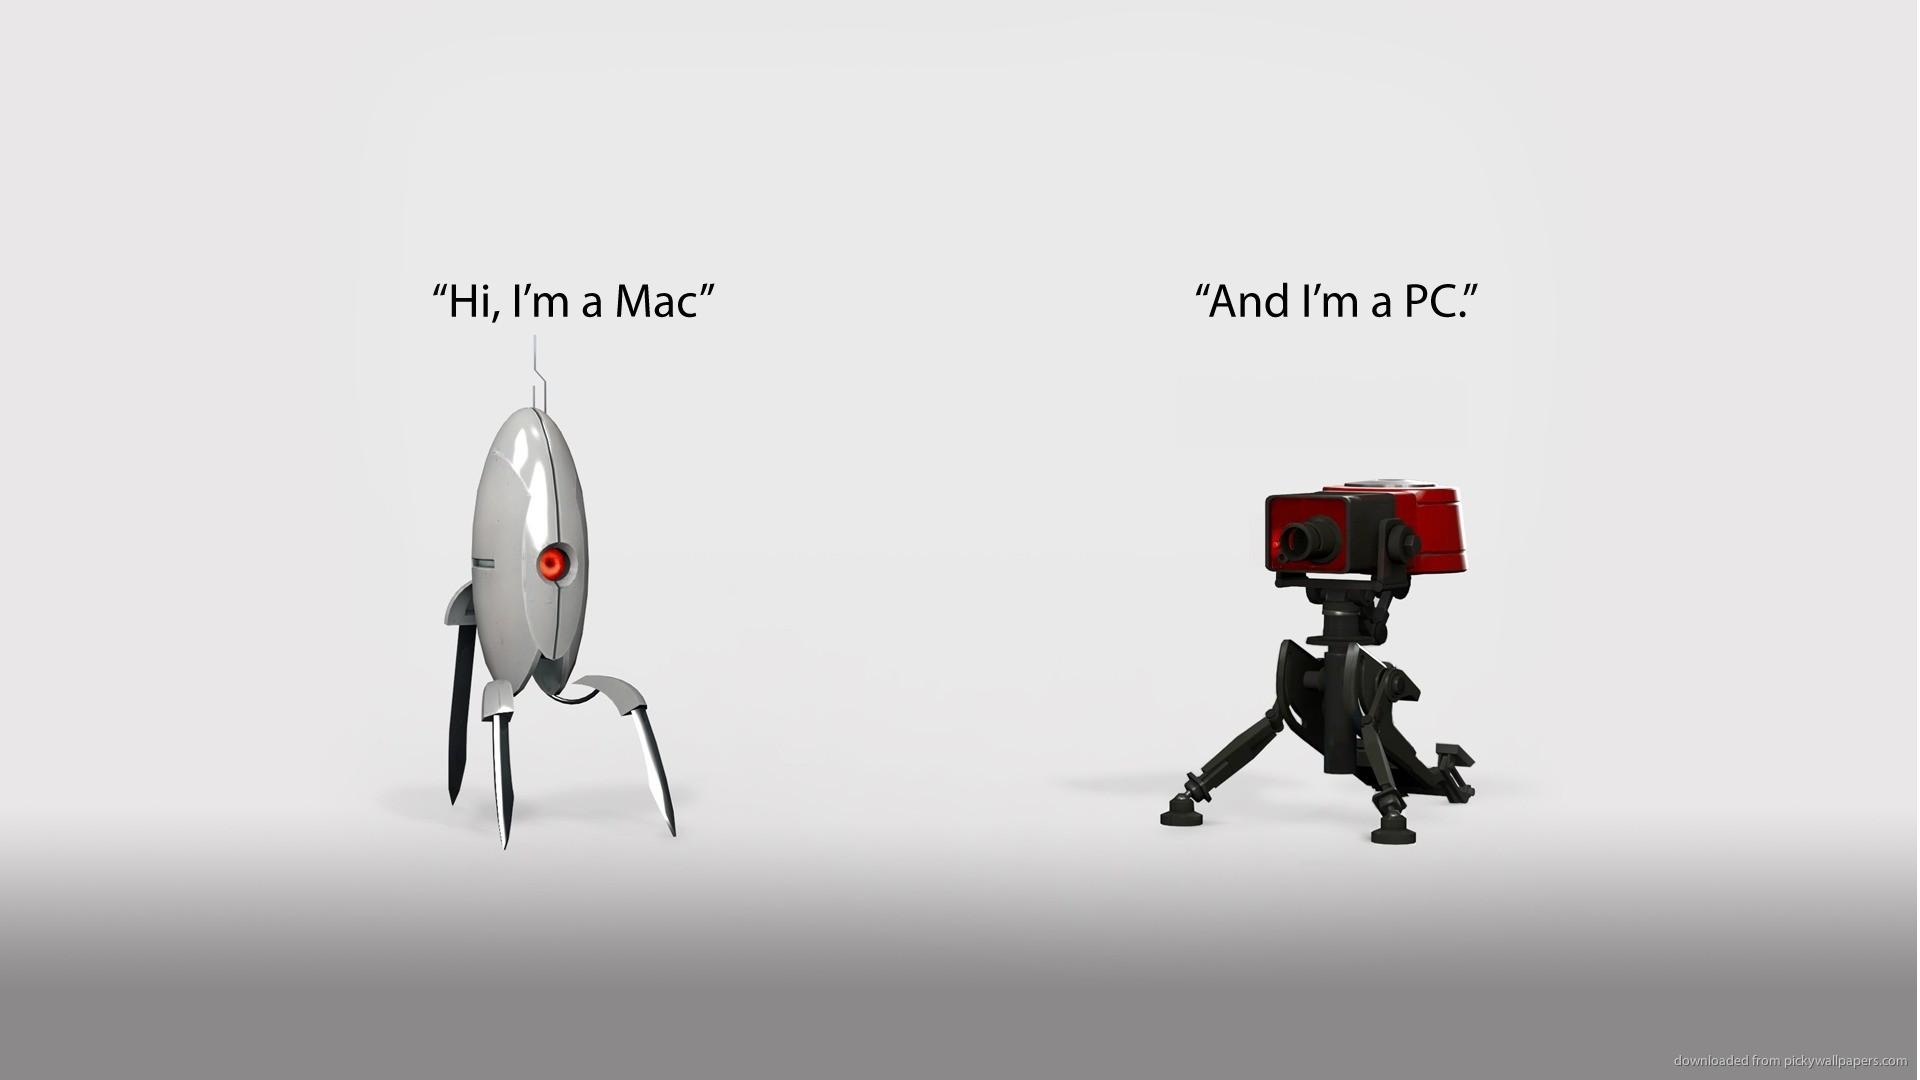 HD Mac and PC turrets wallpaper